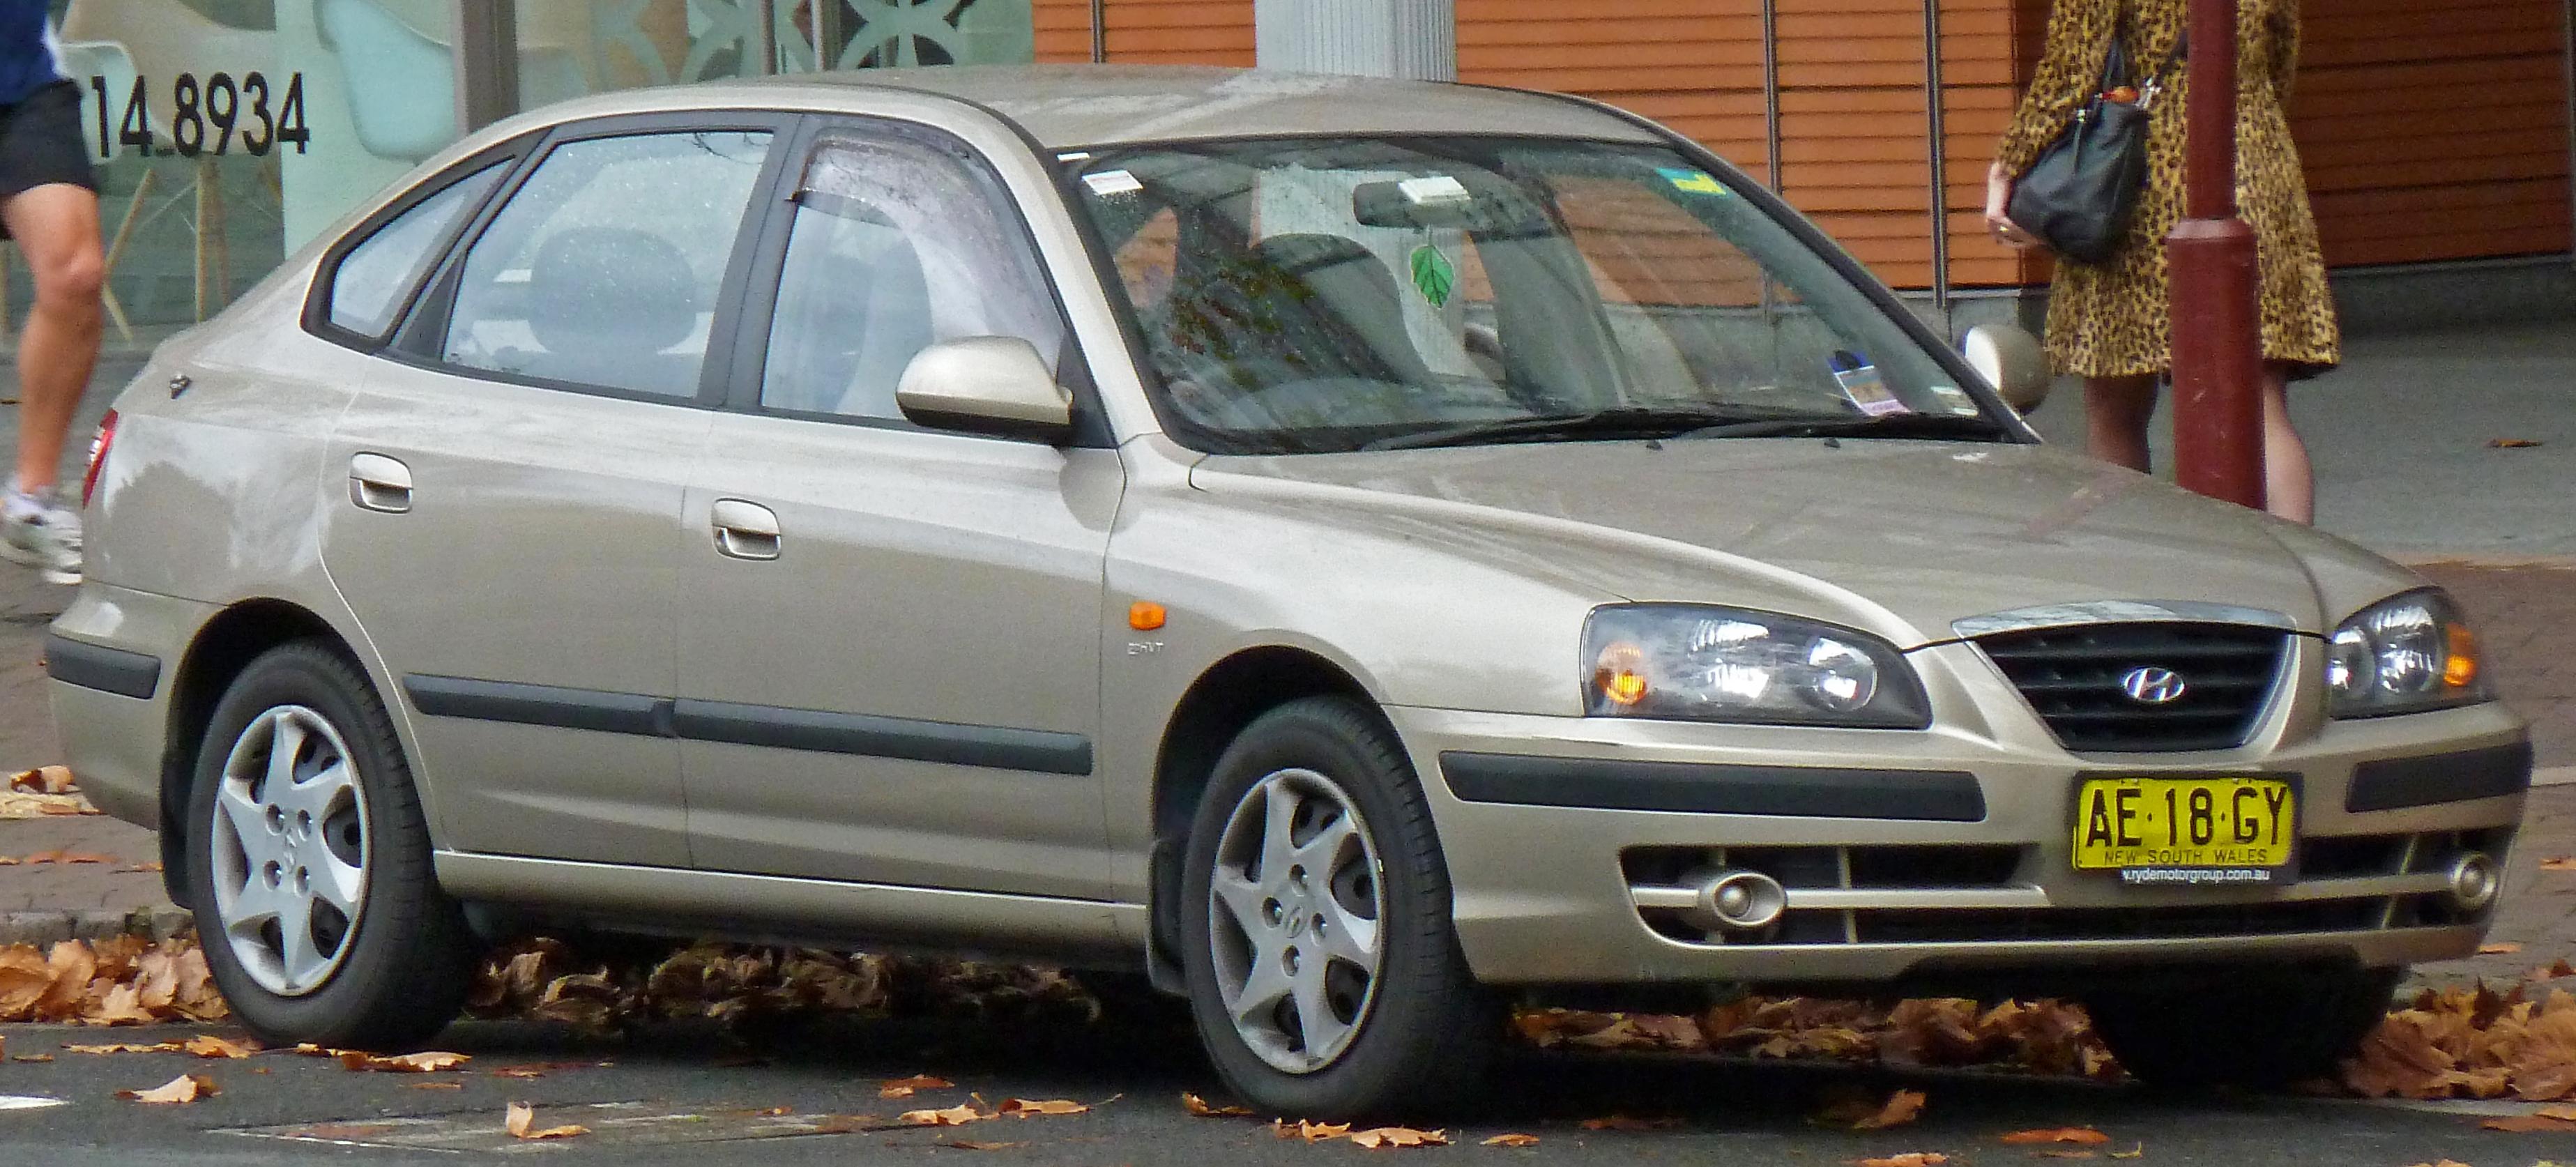 2006 Hyundai Elantra Hatchback | Autos Gallery